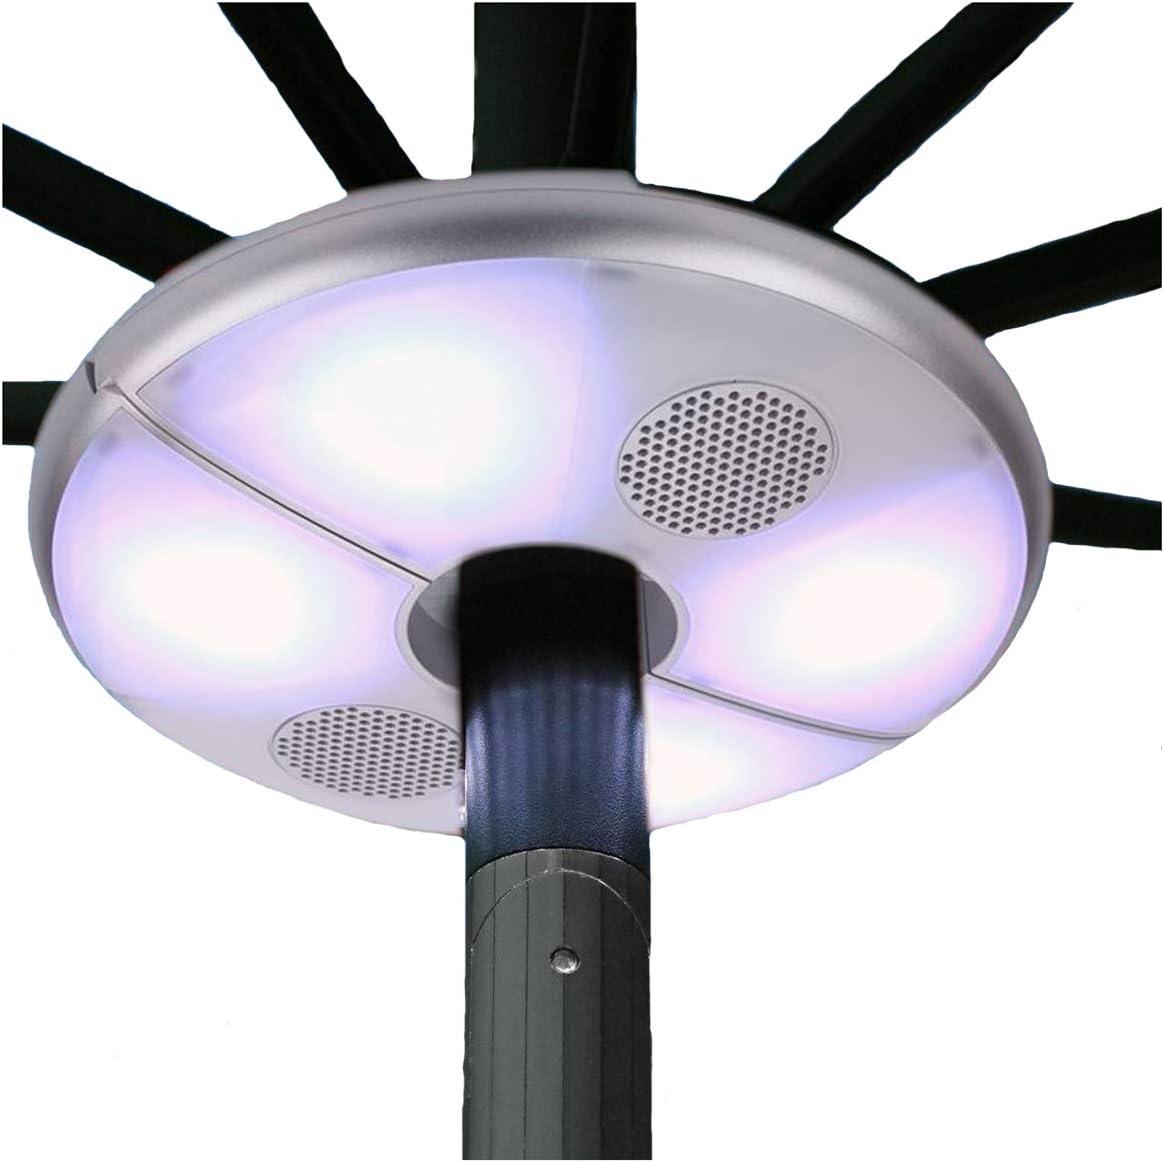 Gazebo Parasol Lights Outdoor Sun Beach Patio Umbrella Led Light Bluetooth Wireless Speakers 2in1 Stereo Speaker Waterproof Rechargeable Amazon Co Uk Kitchen Home